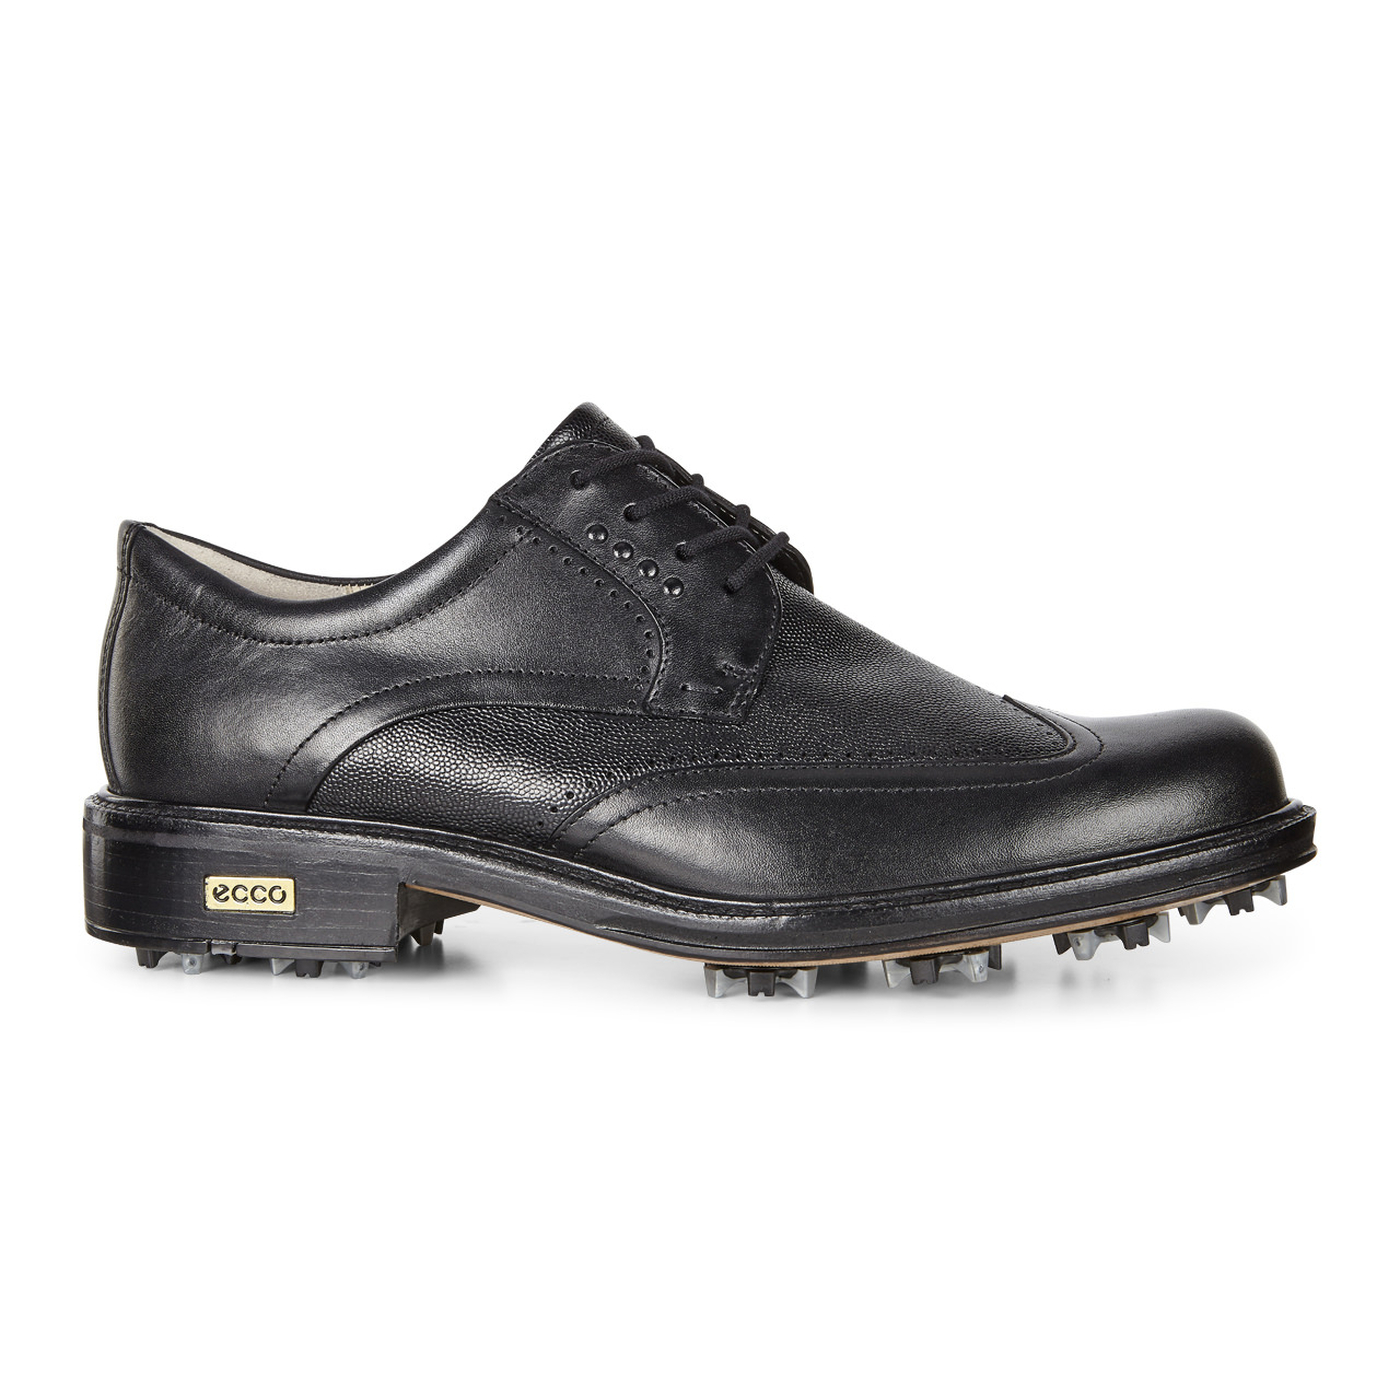 ECCO New WORLD CLASS Golf Mens